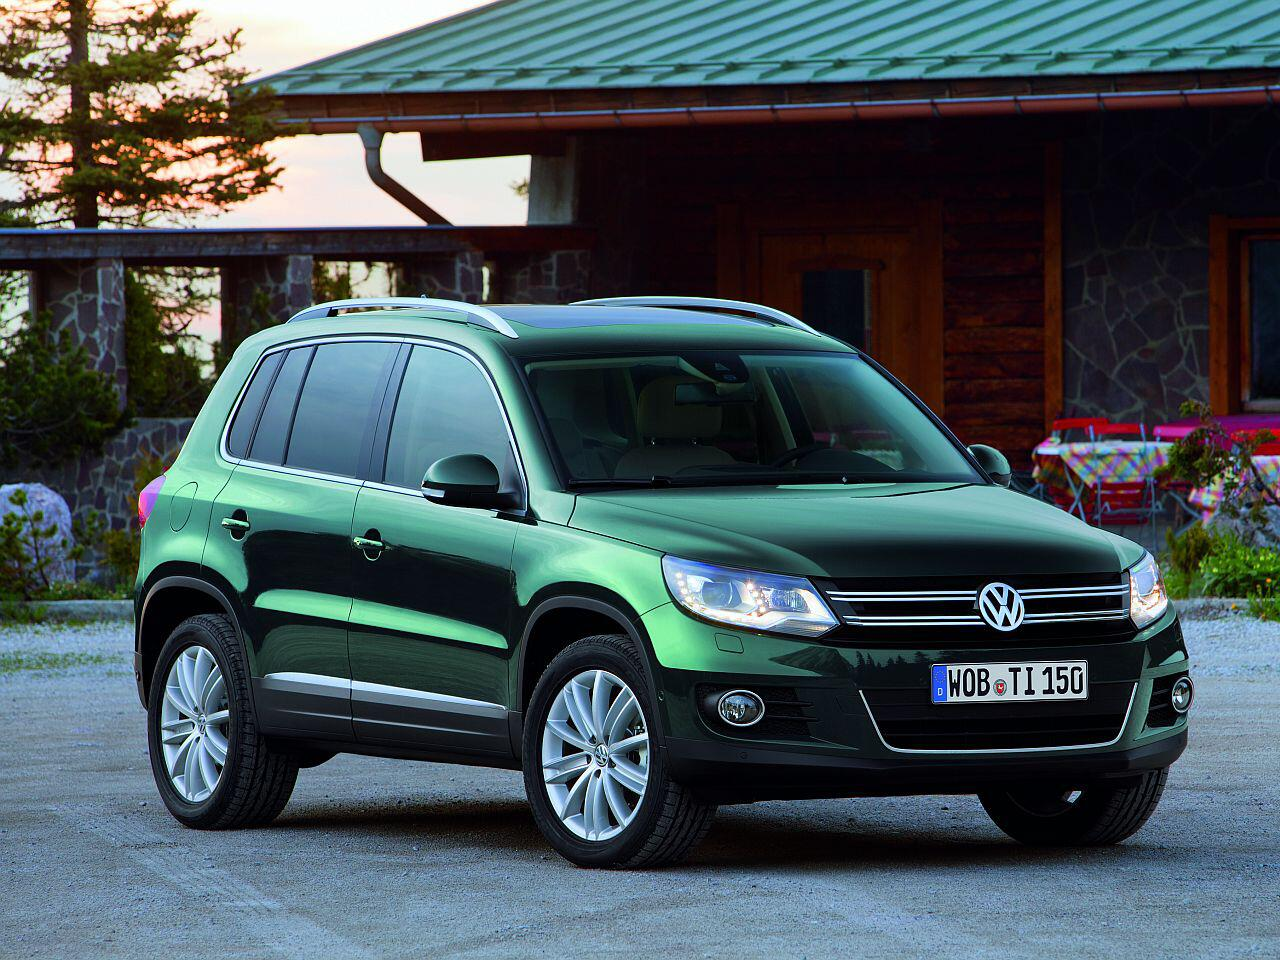 Bild zu Platz 10: VW Tiguan 2.0 TSI